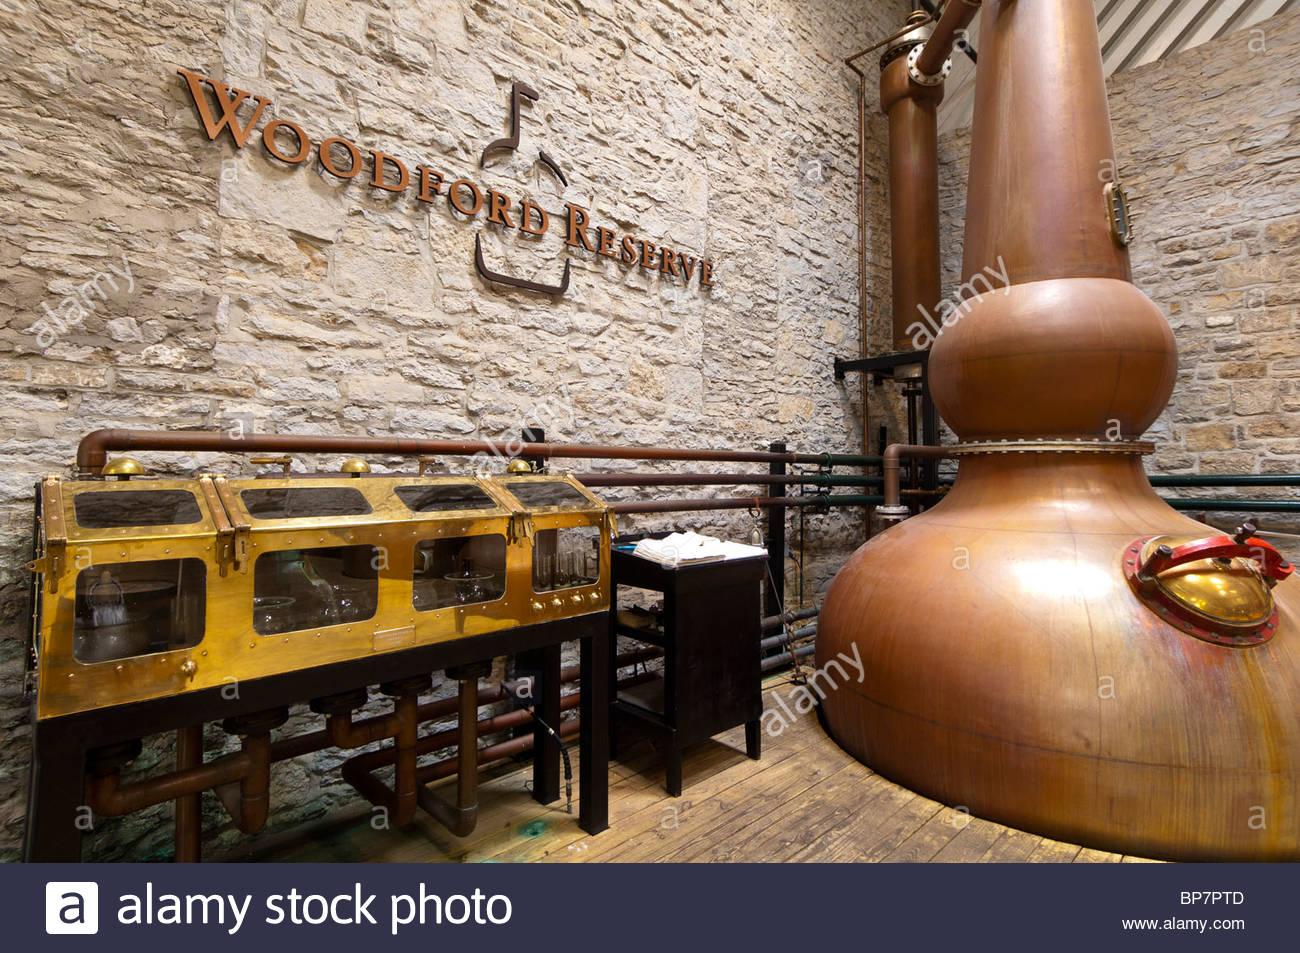 Copper pot stills, Woodford Reserve Distillery (premium bourbon), Versailles (near Lexington), Kentucky USA - Stock Image